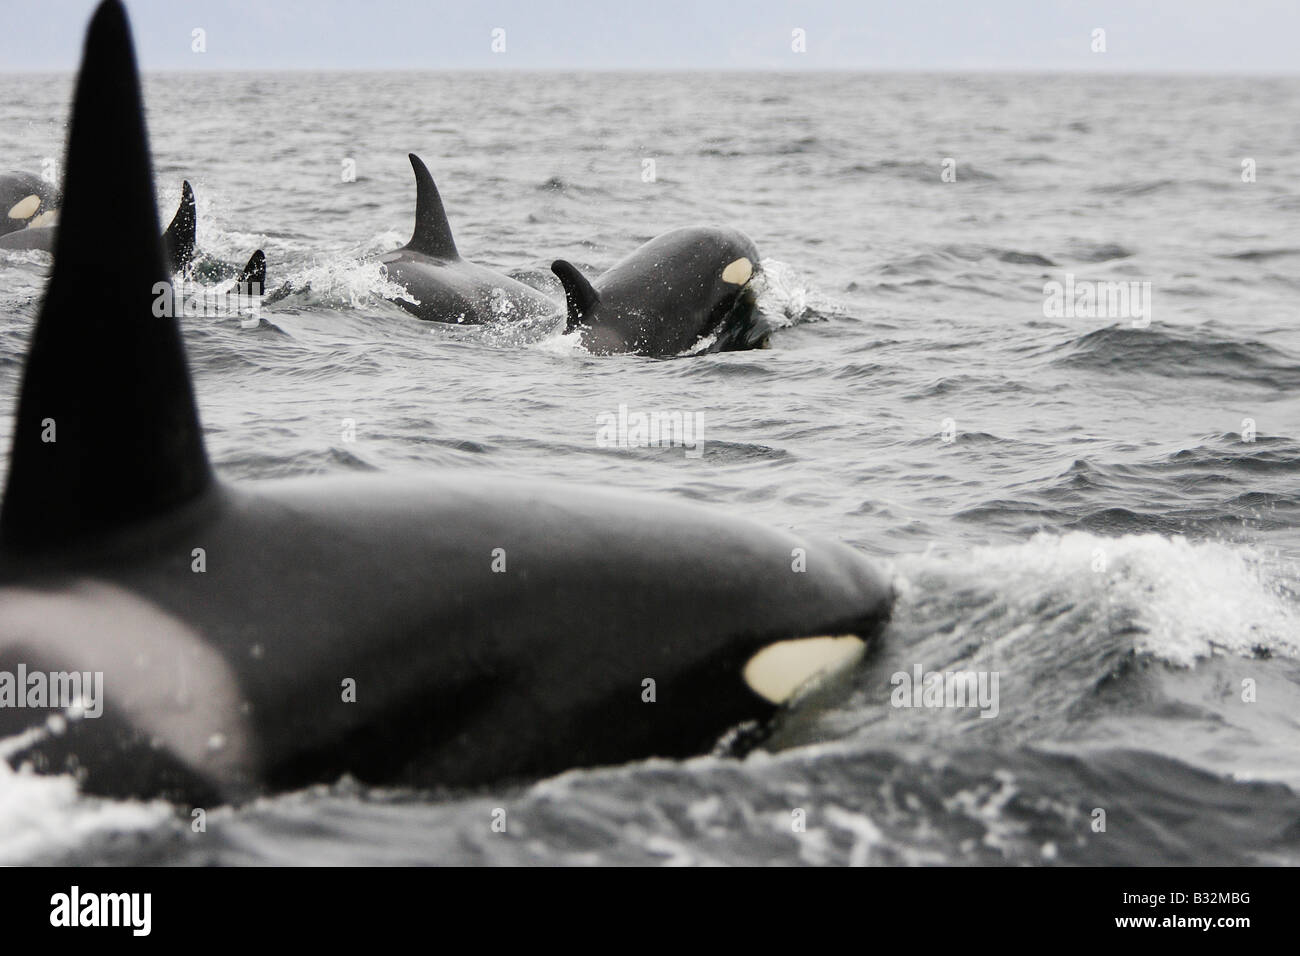 Orca Whale Killer Whale (Orcinus orca) Pod near the Lofoten - Stock Image